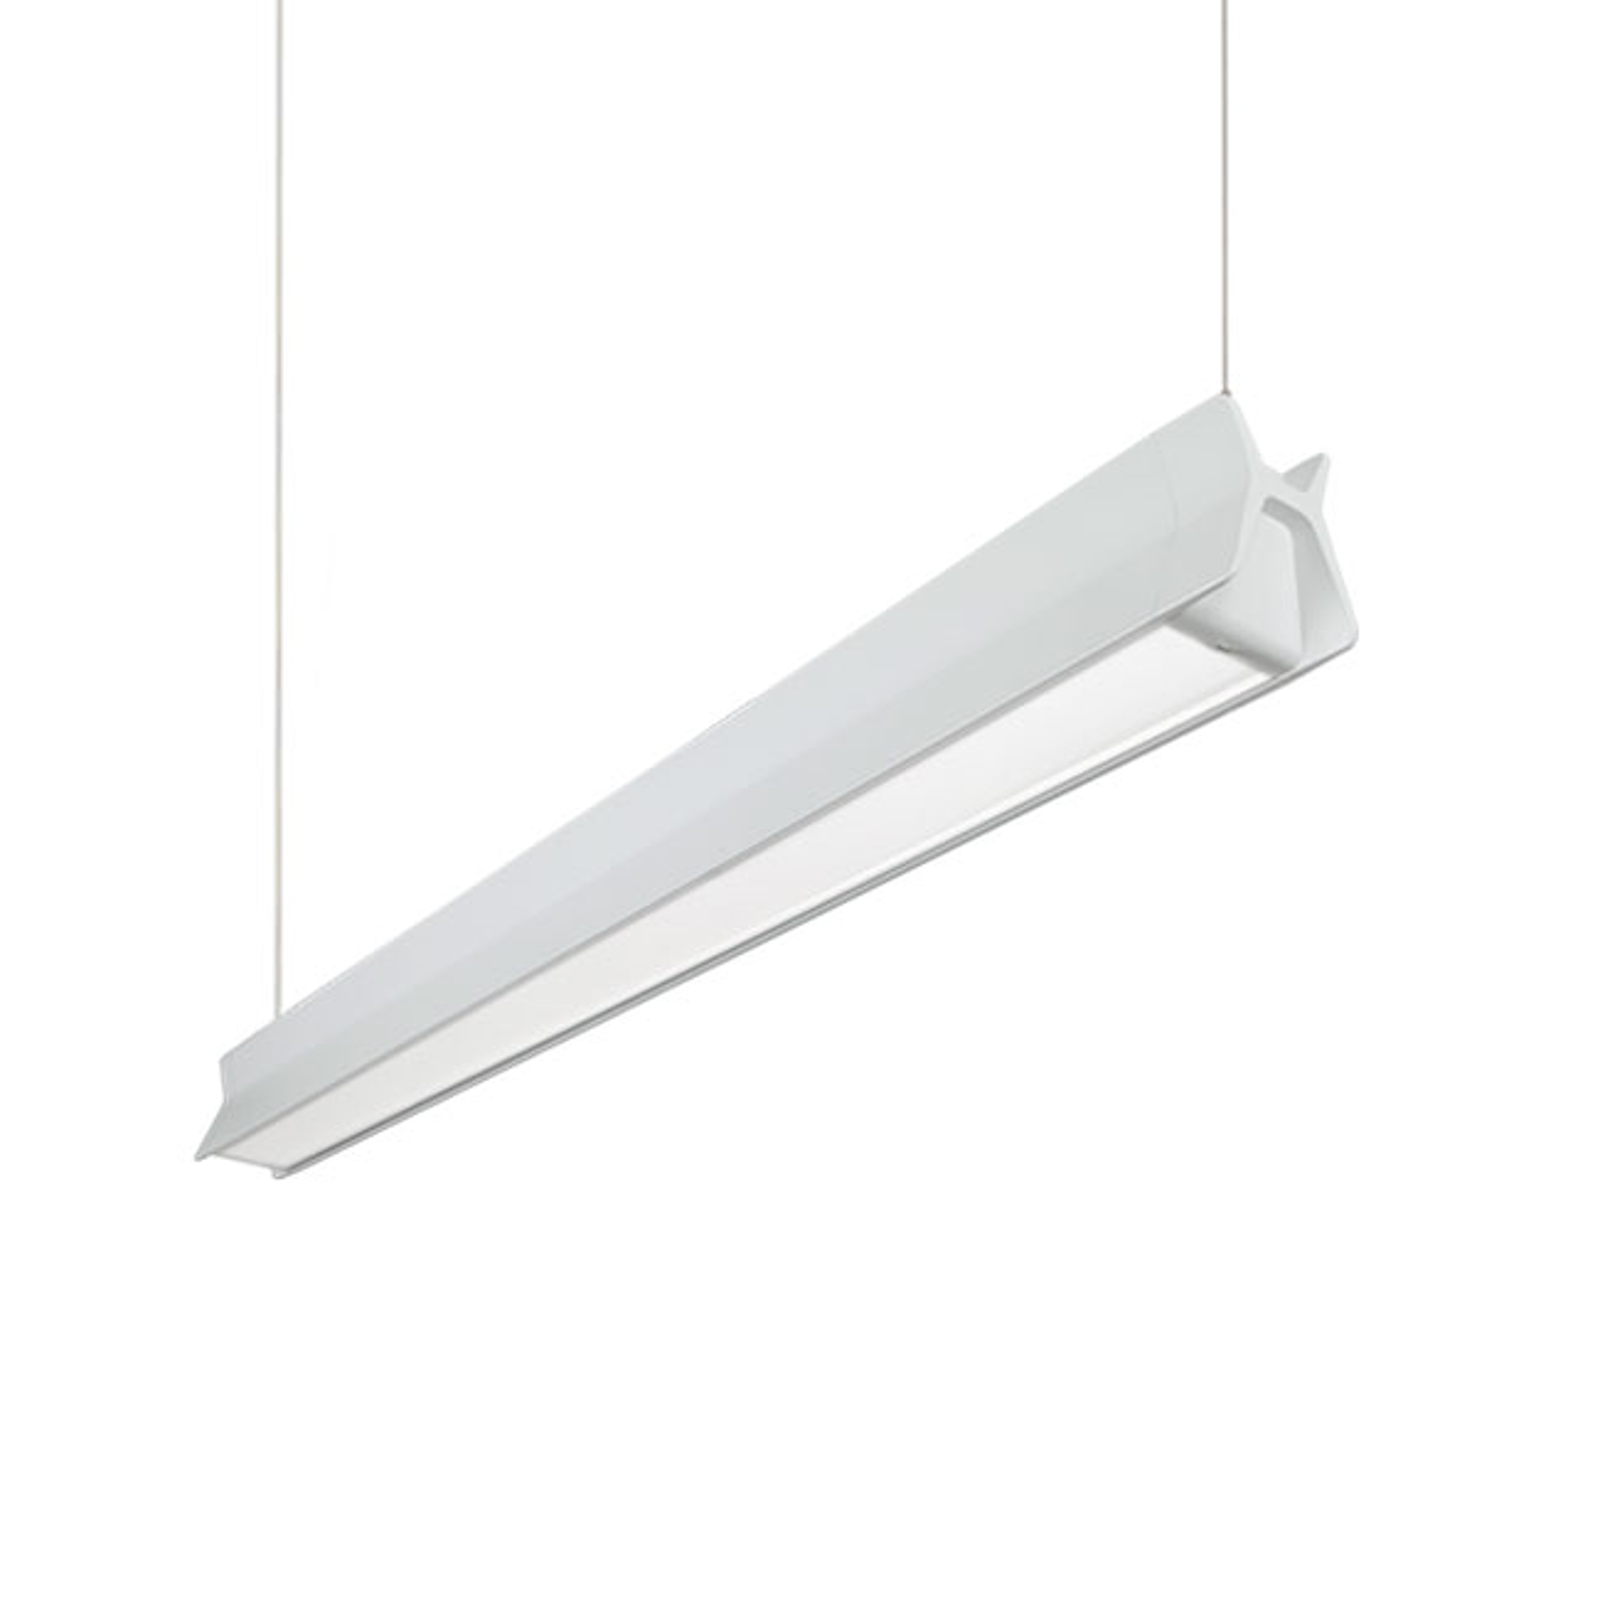 Suspension LED C56-P1200, 50/50, blanche, 126,3cm